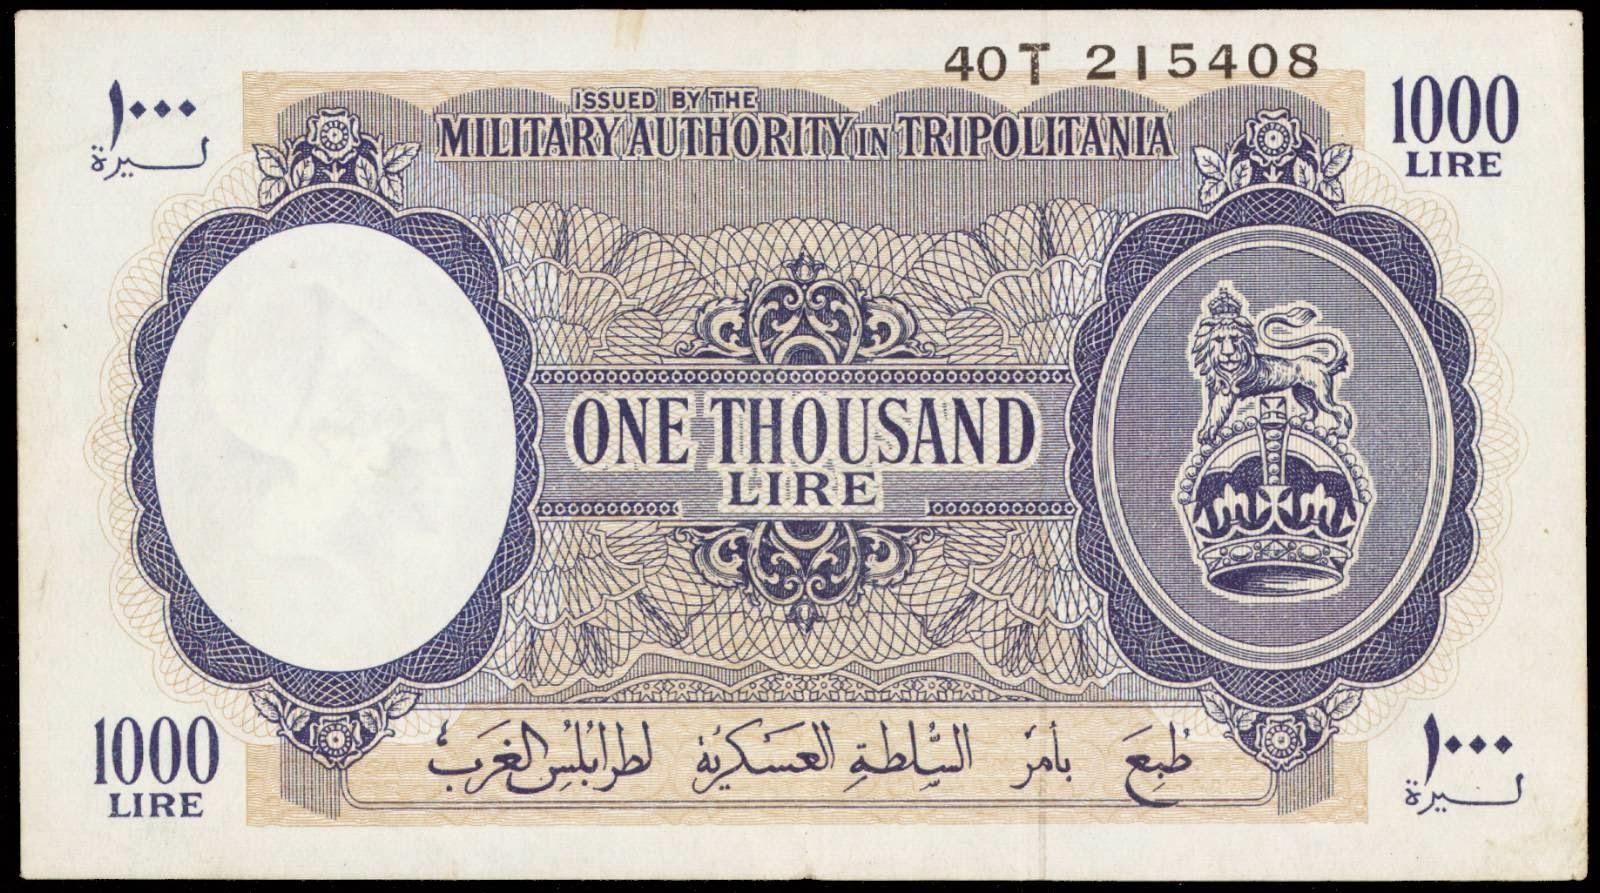 Libya 1000 Lire Note 1943 Military Authority in ... - photo#22